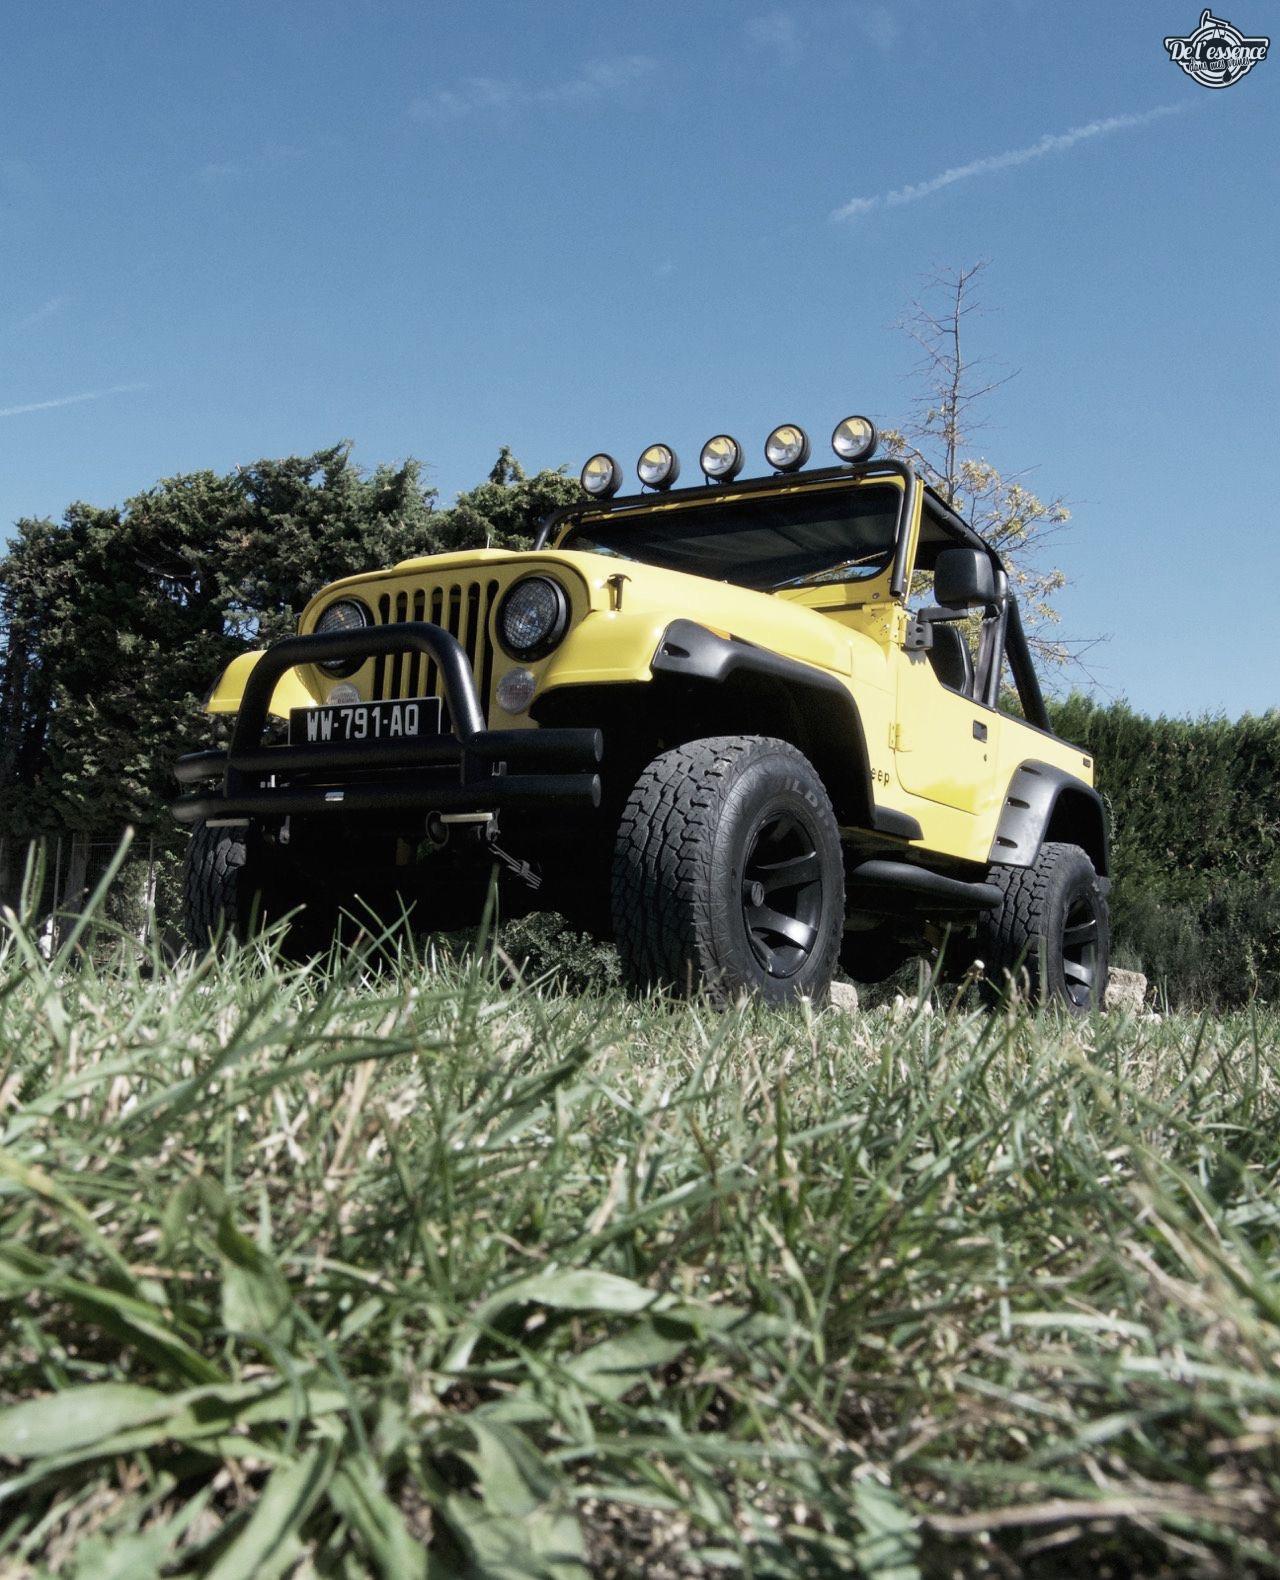 '82 Jeep CJ-7 Laredo - Quand tu te fais chier sur la route... 73